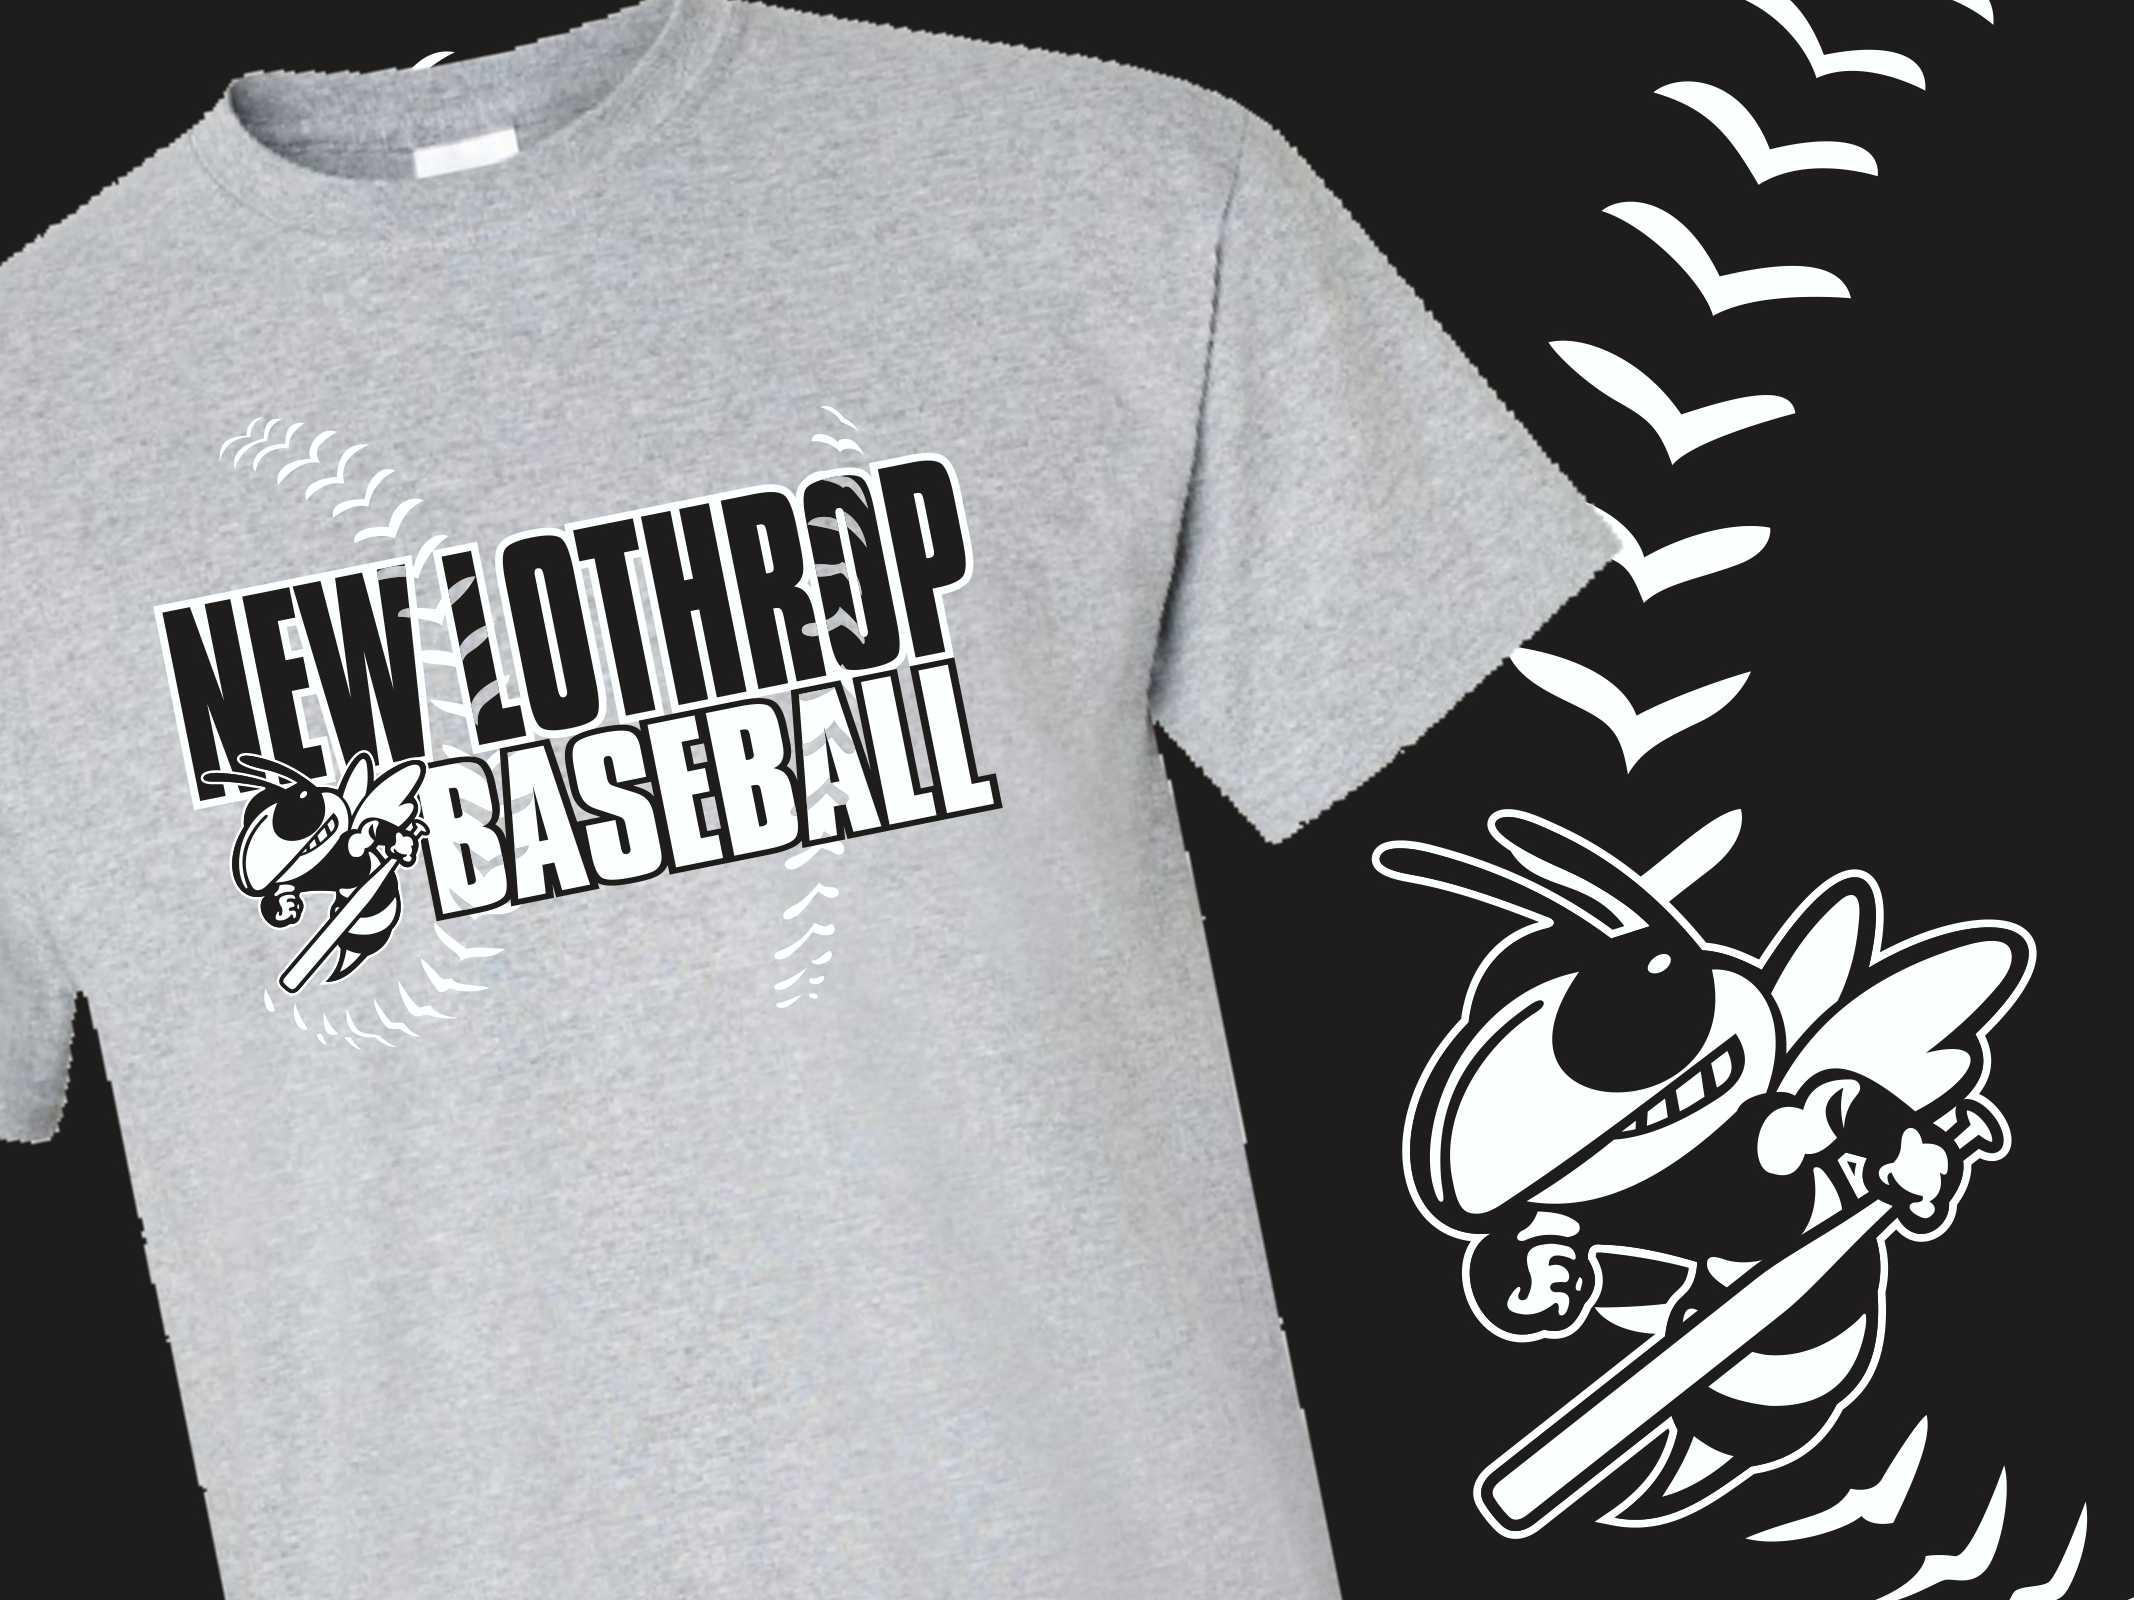 New Lathrop Baseball